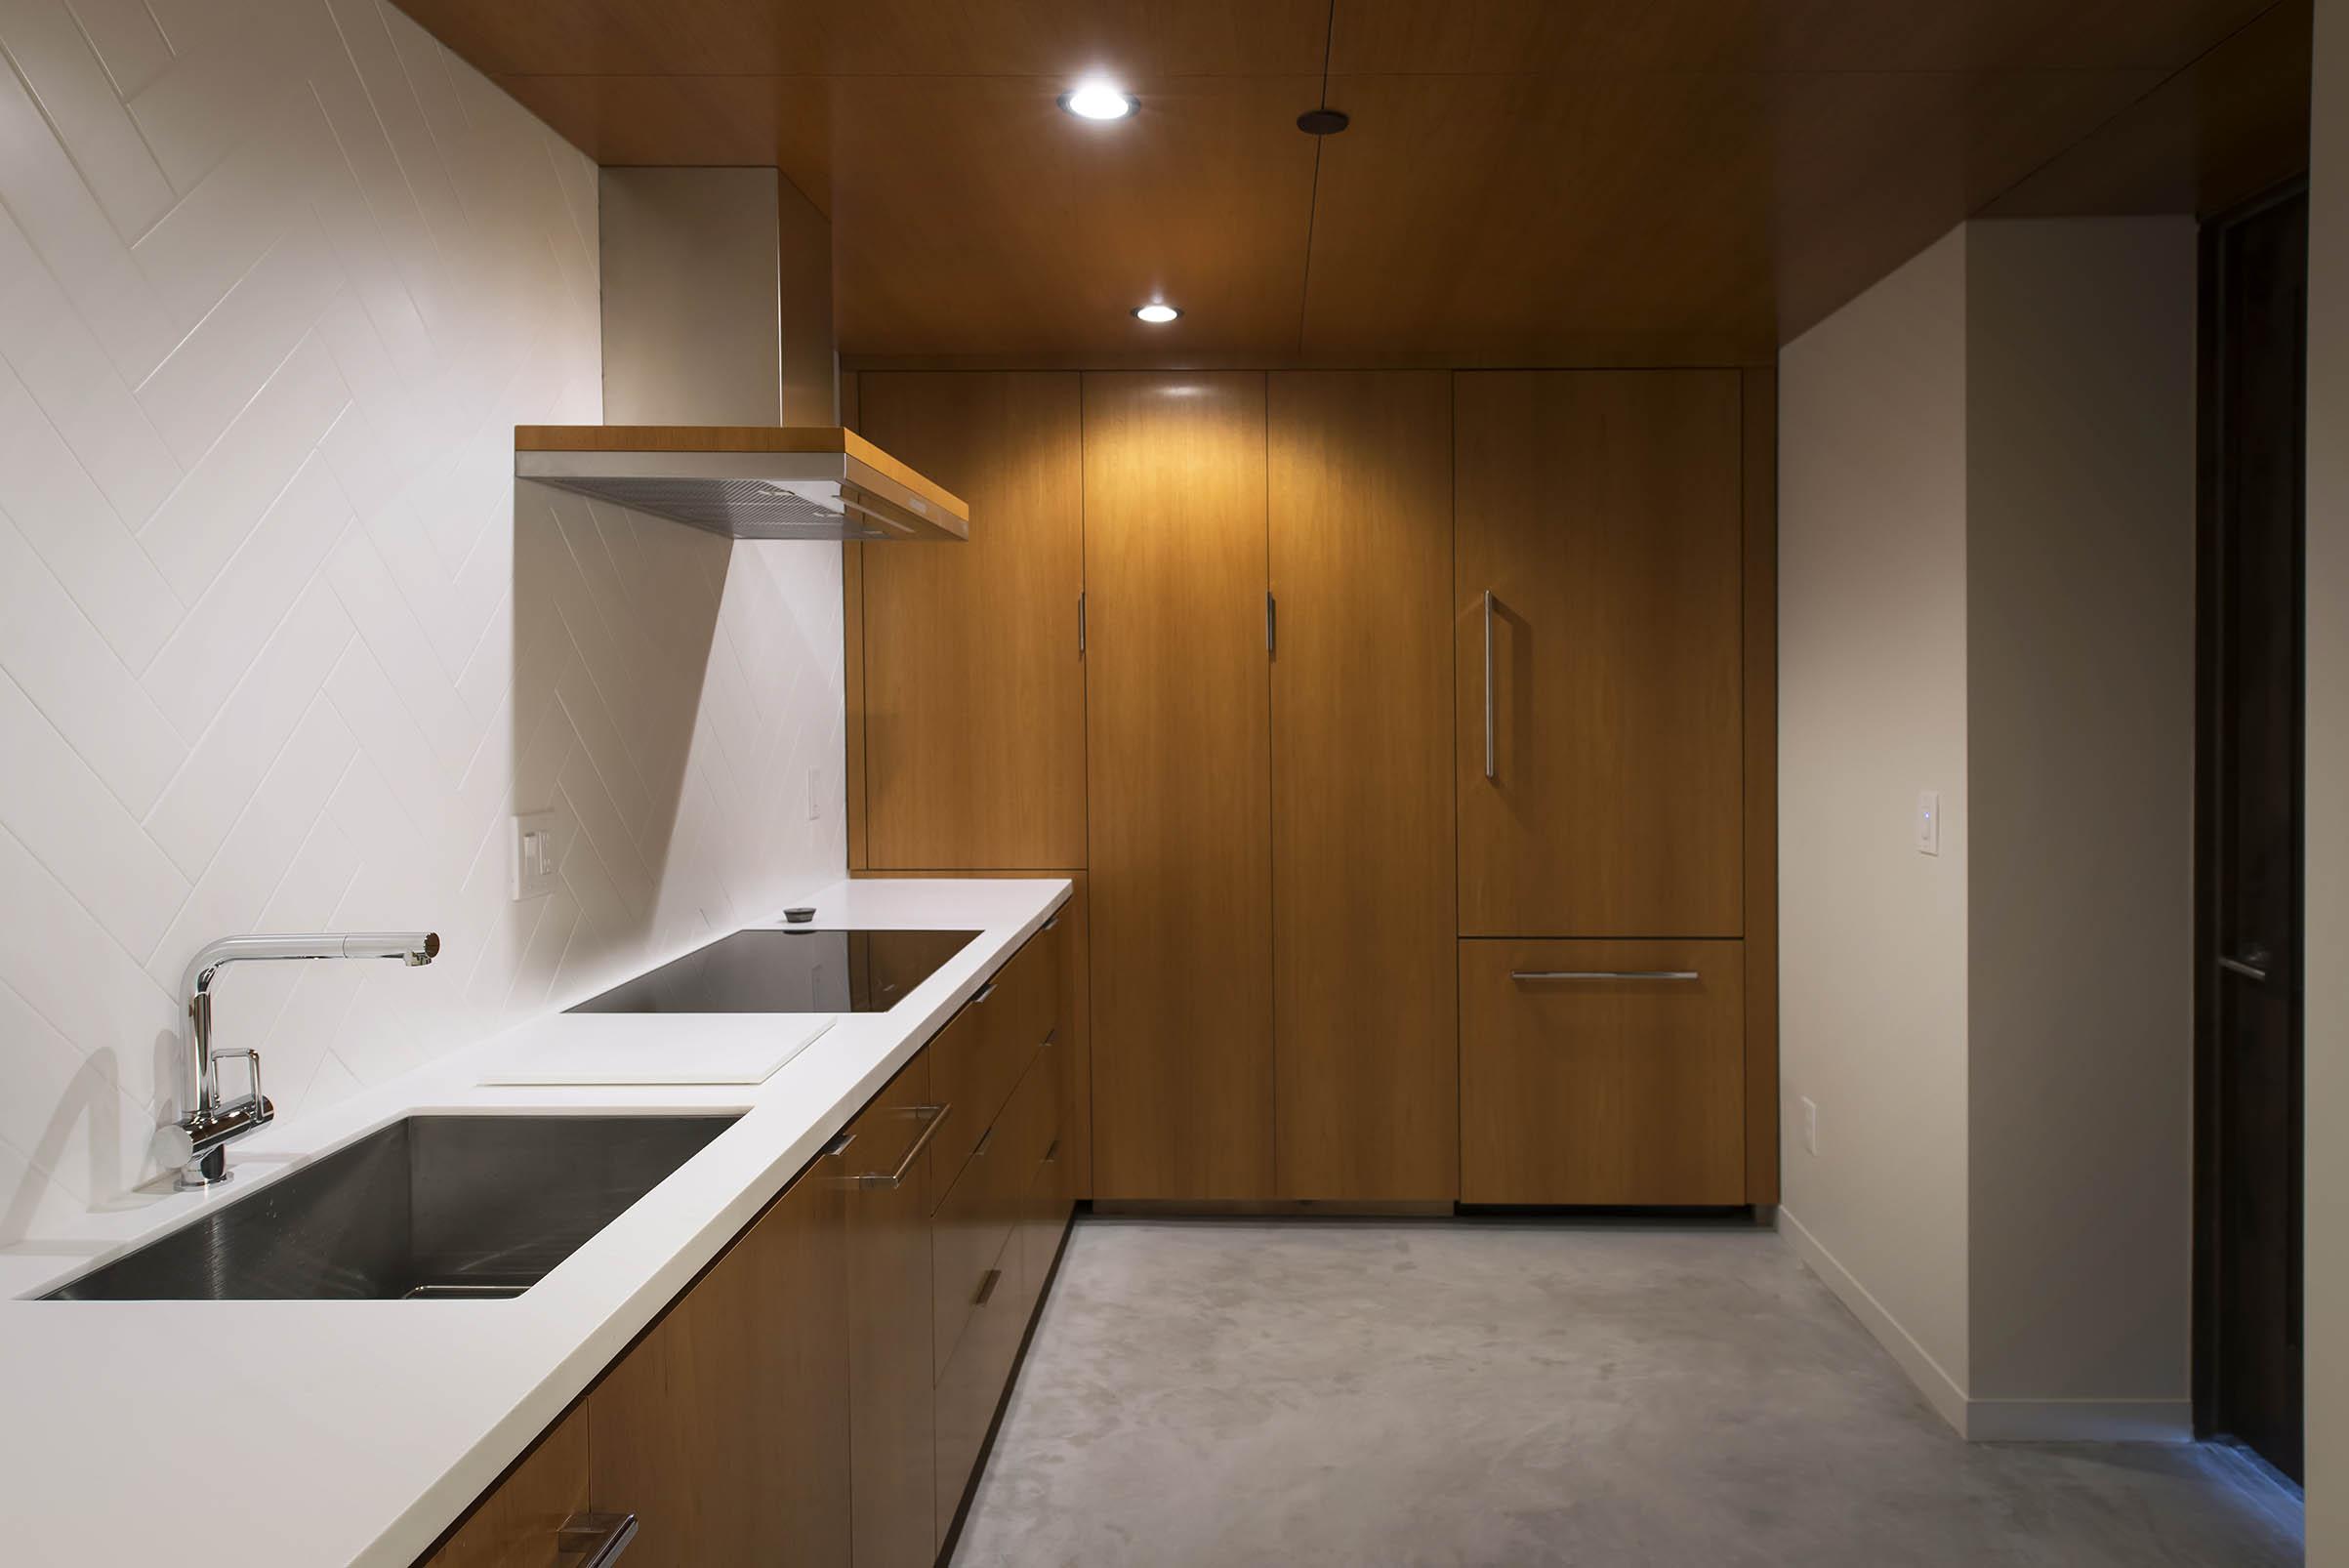 tasting room kitchen